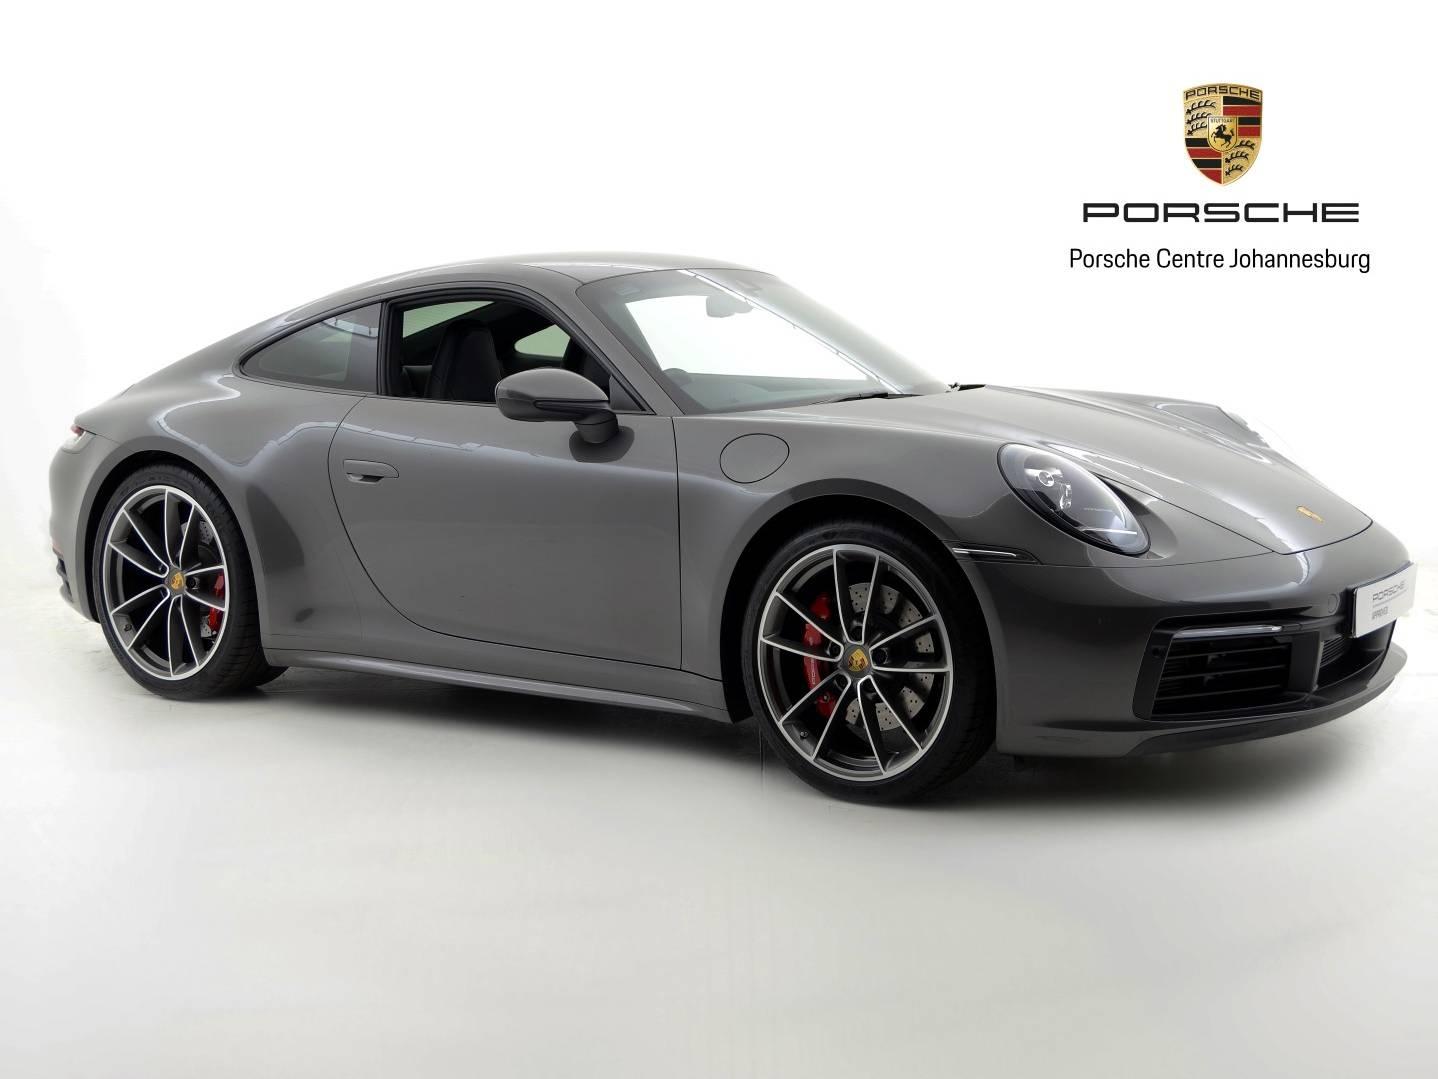 2020 Porsche 911 Carrera 4S – 1